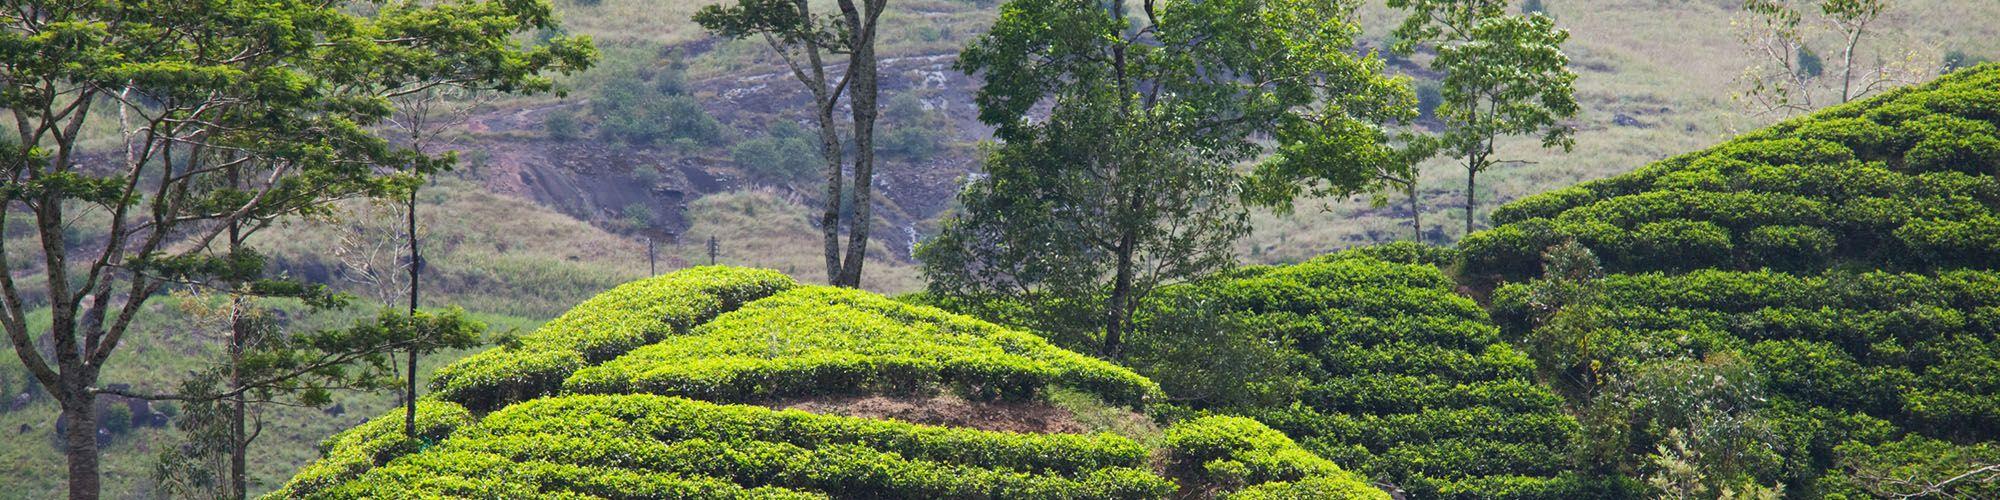 Sri Lanka, Plantations thé, Kandy